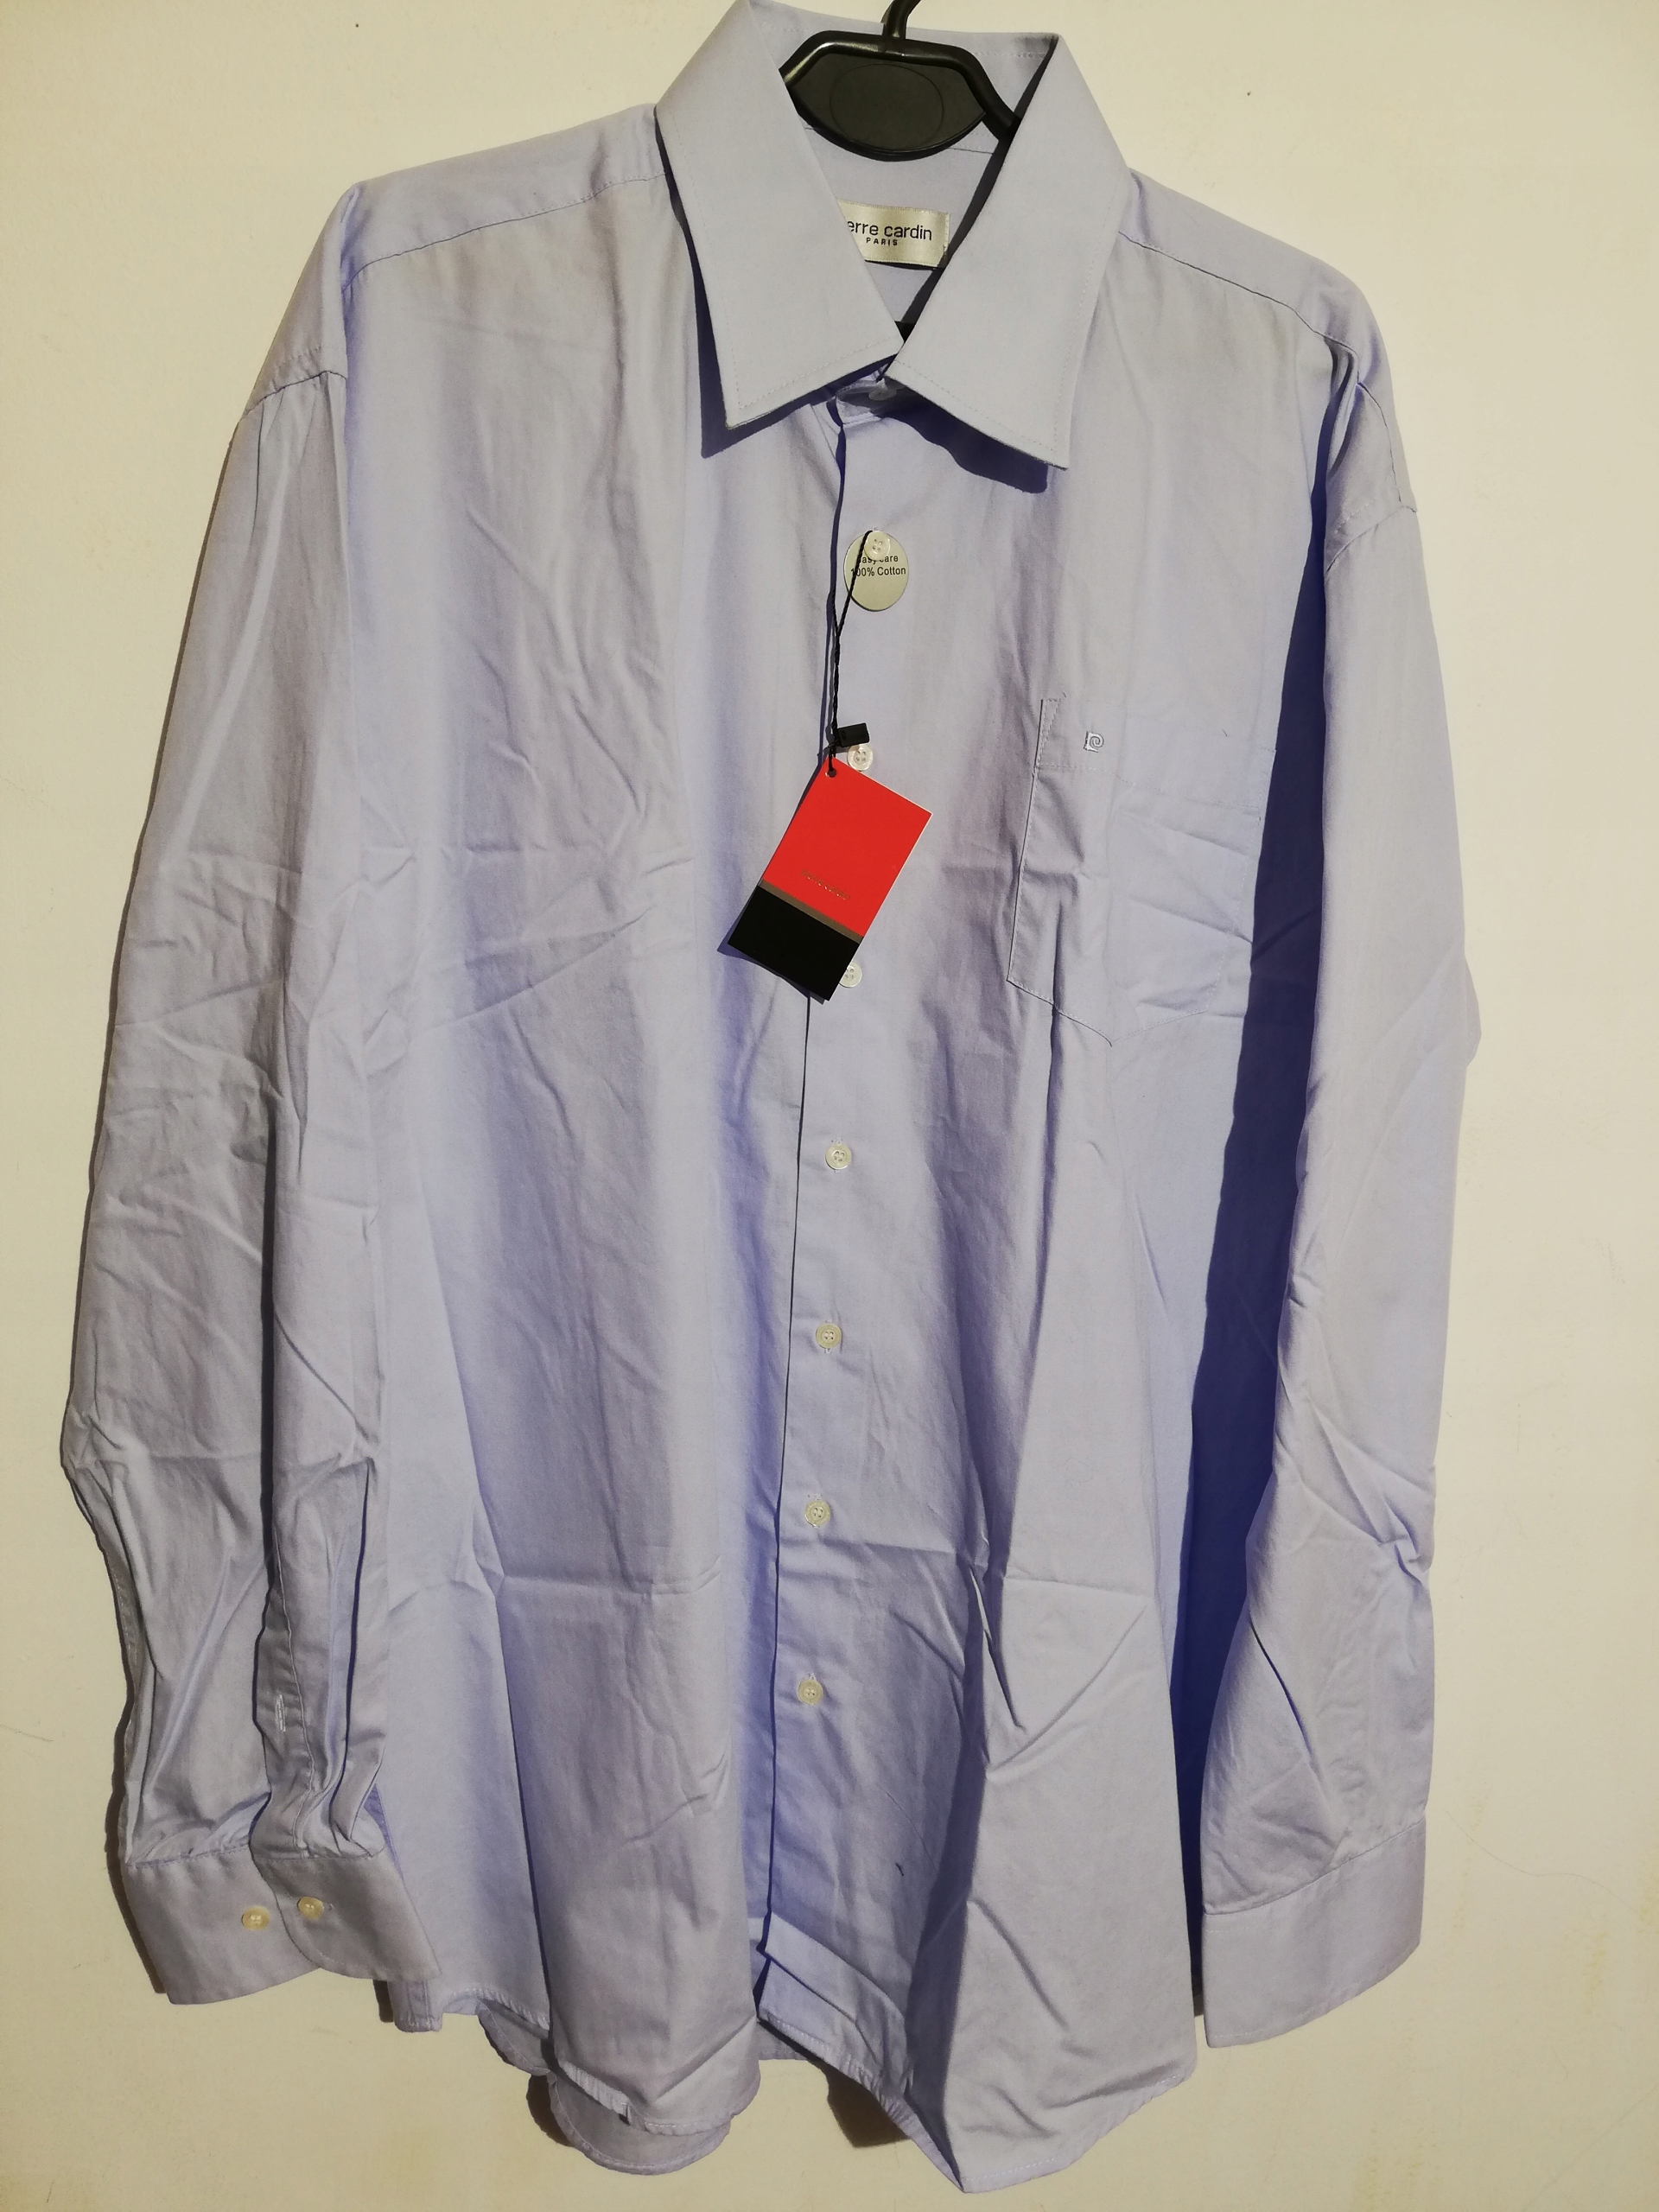 Pierre Cardin koszula męska rozm XL 43/44